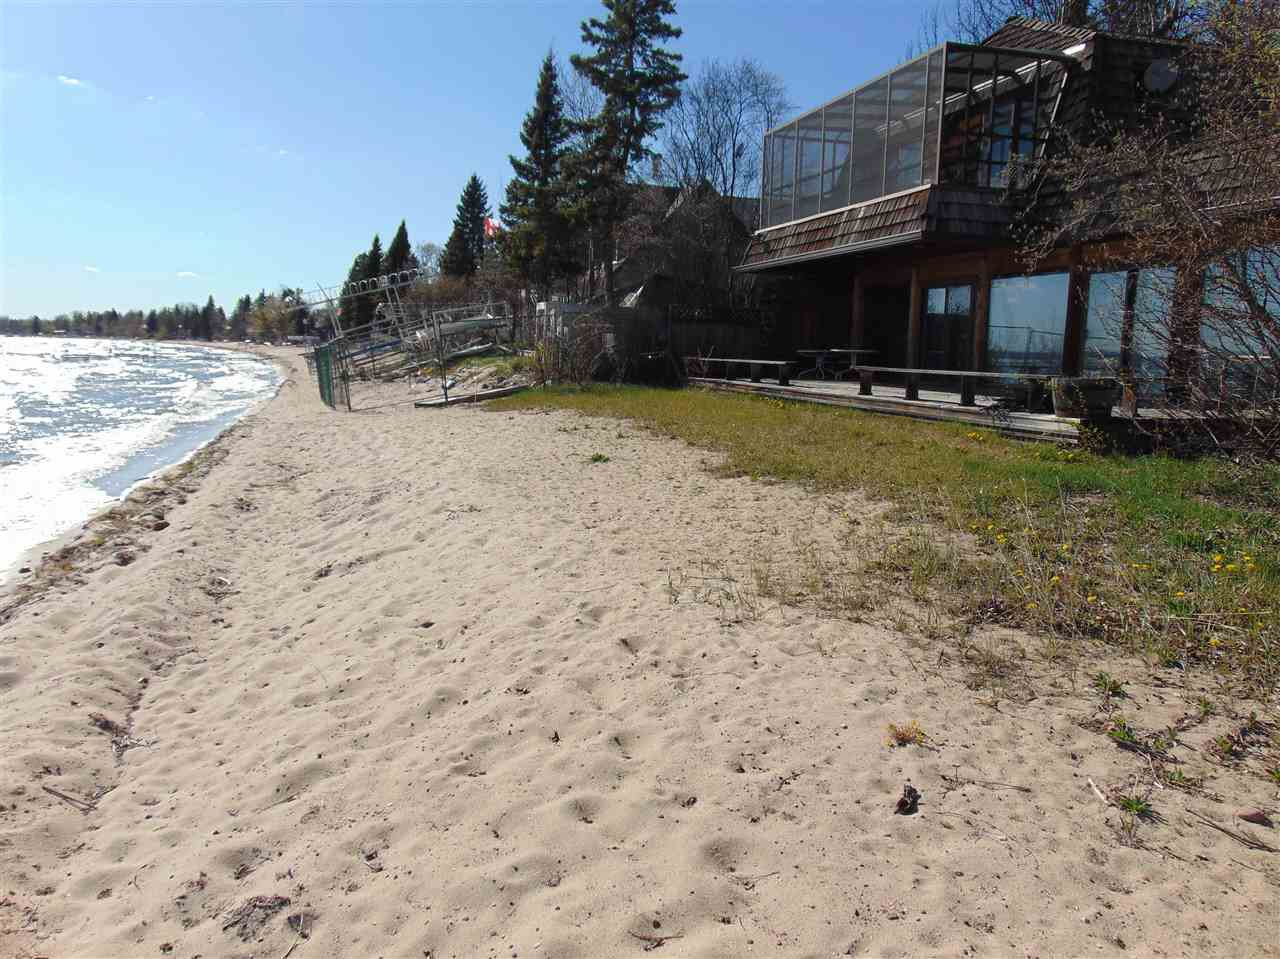 Main Photo: 12A Argentia Beach: Rural Wetaskiwin County Rural Land/Vacant Lot for sale : MLS®# E4195554